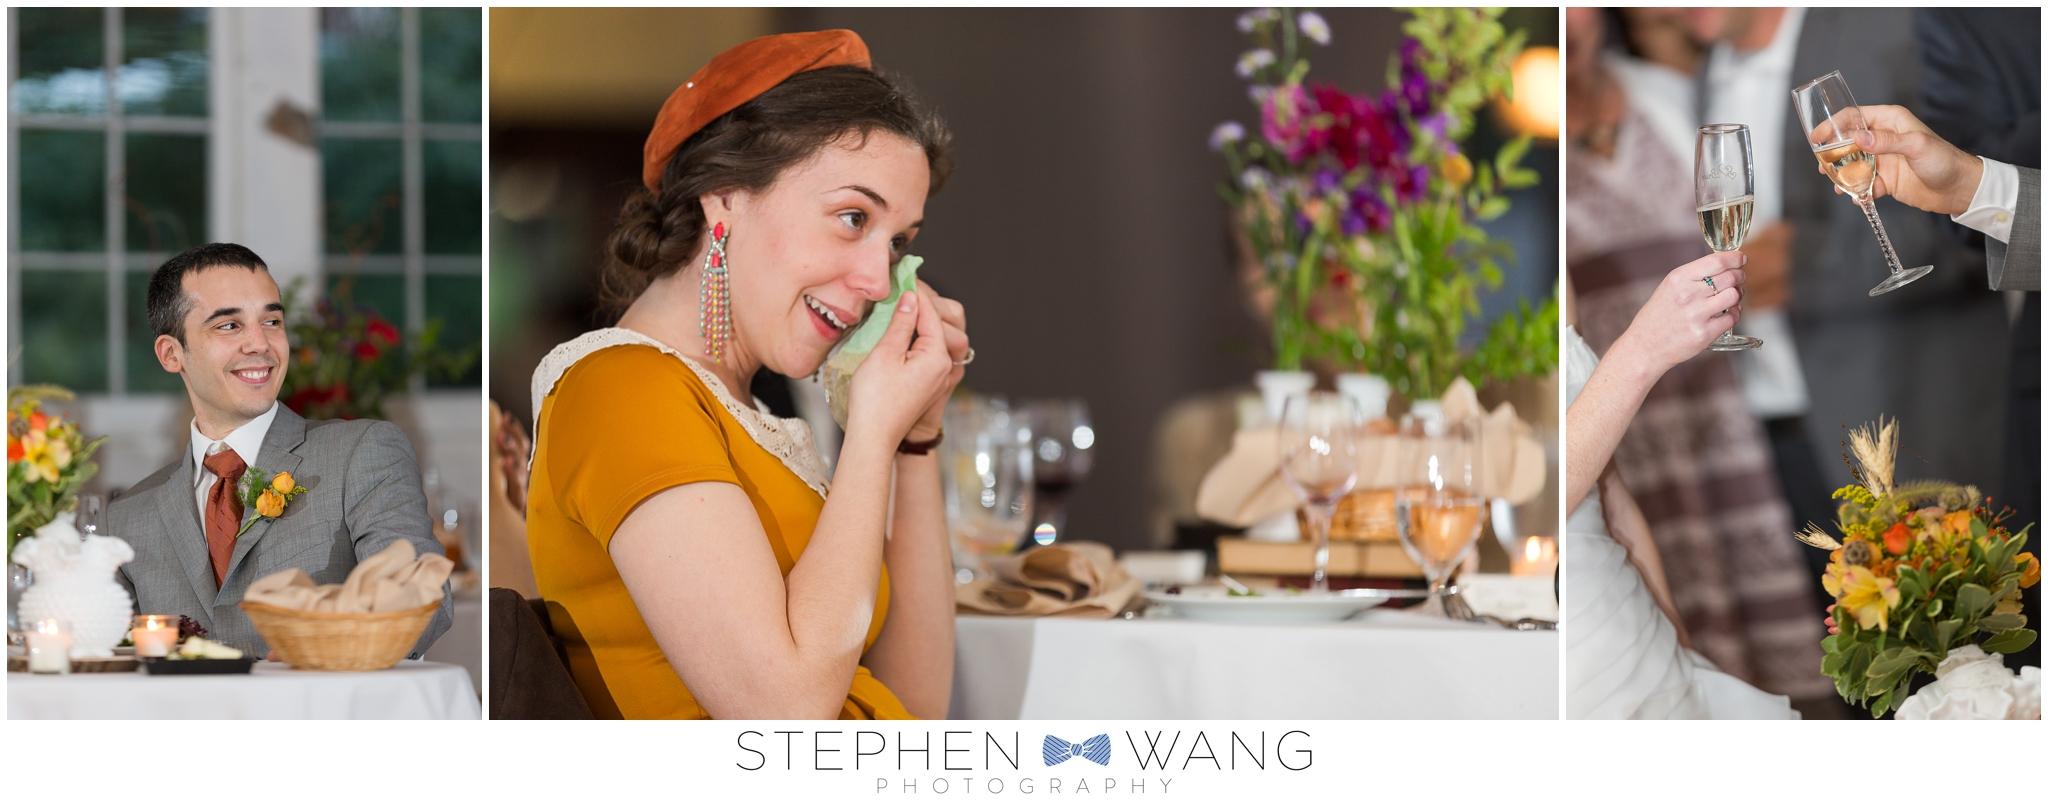 Stephen Wang Photography wedding connecticut deep river lace factory wedding photography connecticut photographer-01-22_0020.jpg